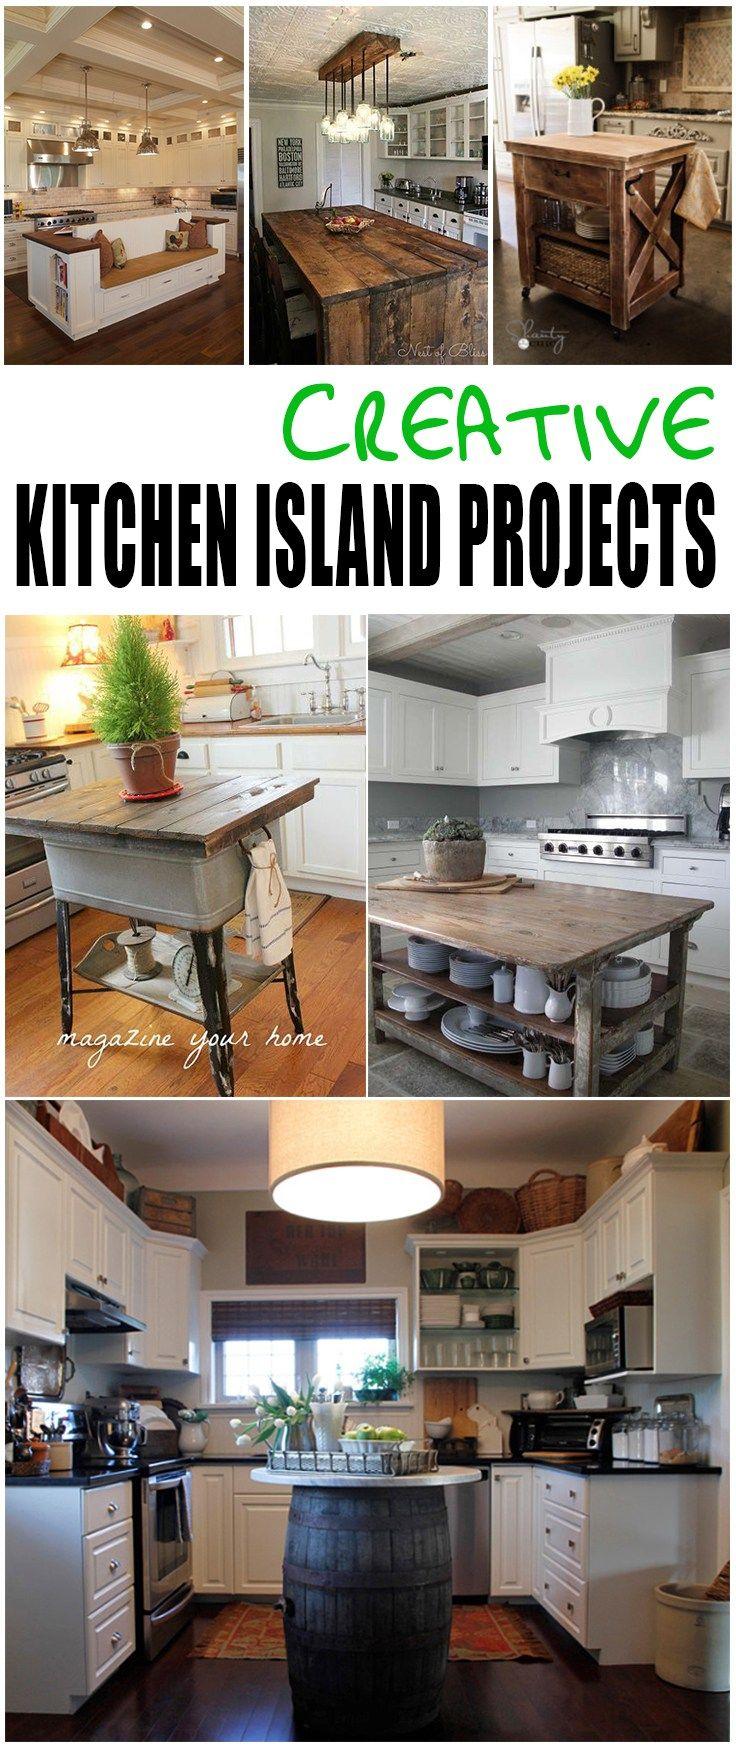 17 best images about diy crafts kitchen carts islands for Creative kitchen island designs